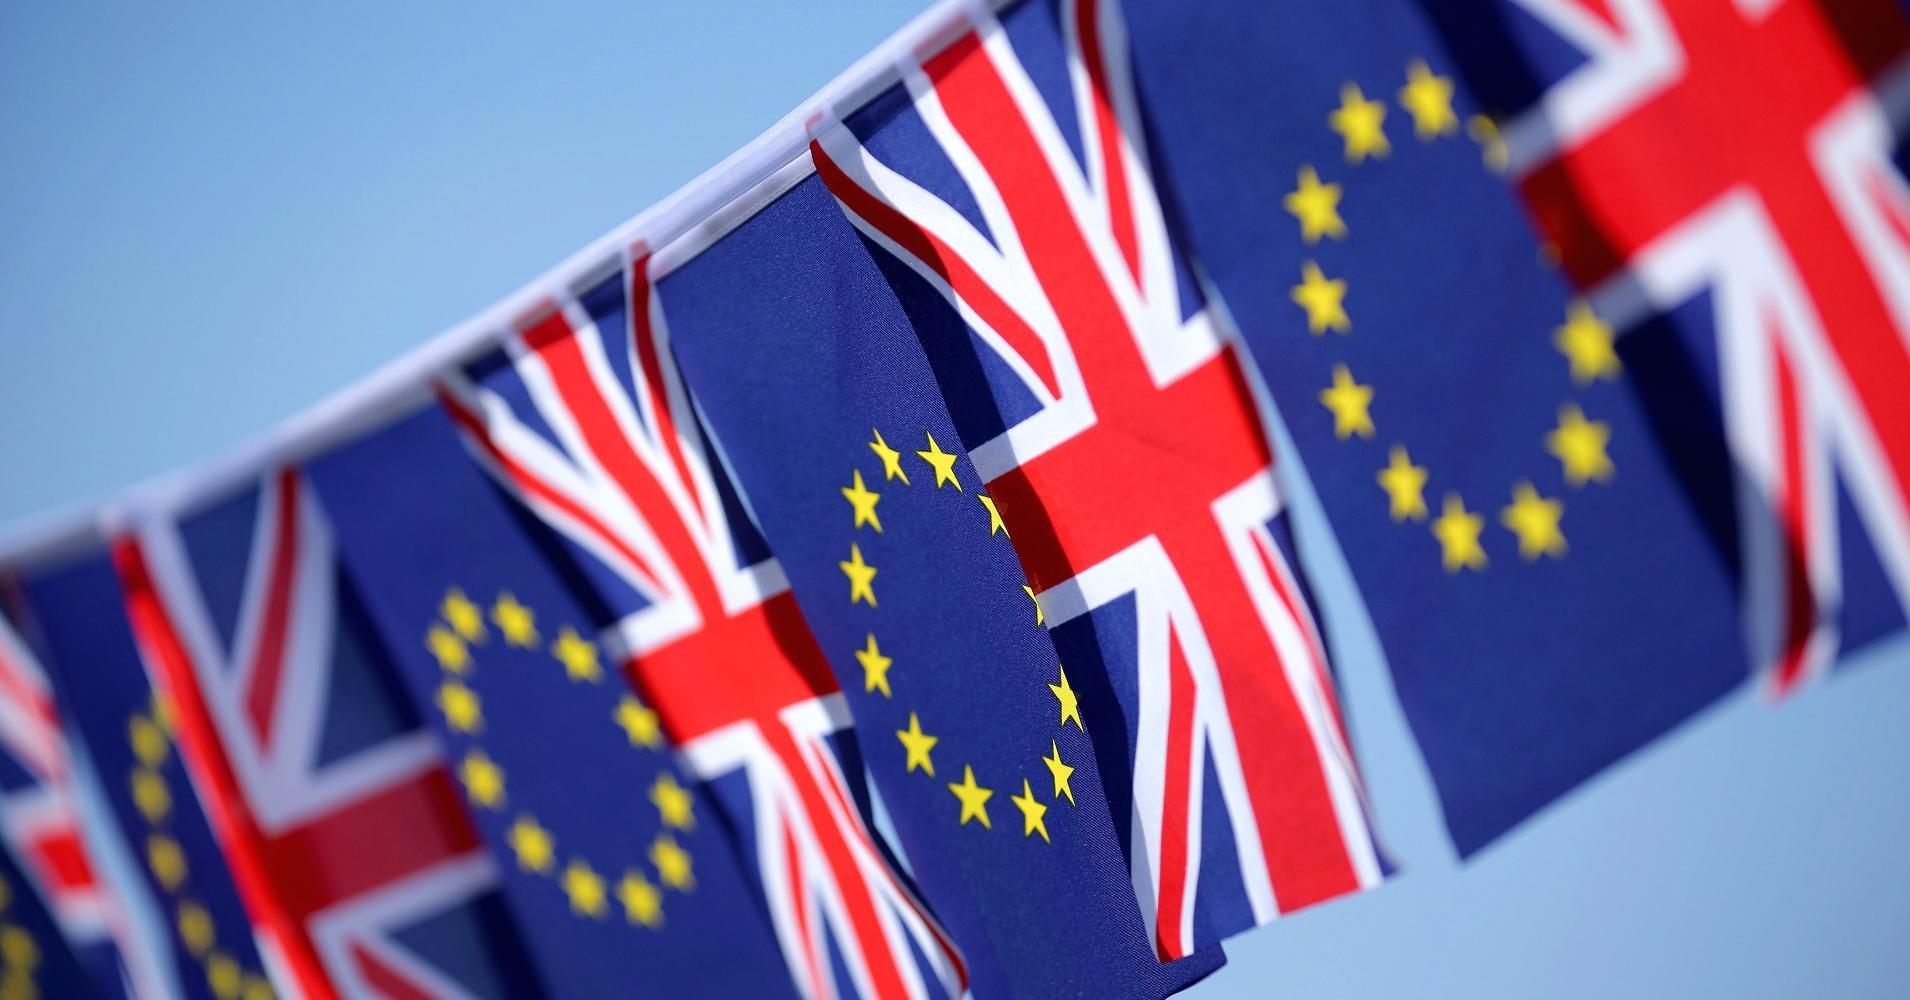 Европарламент выставил Великобритании счёт в 60 млрд евро за Brexit